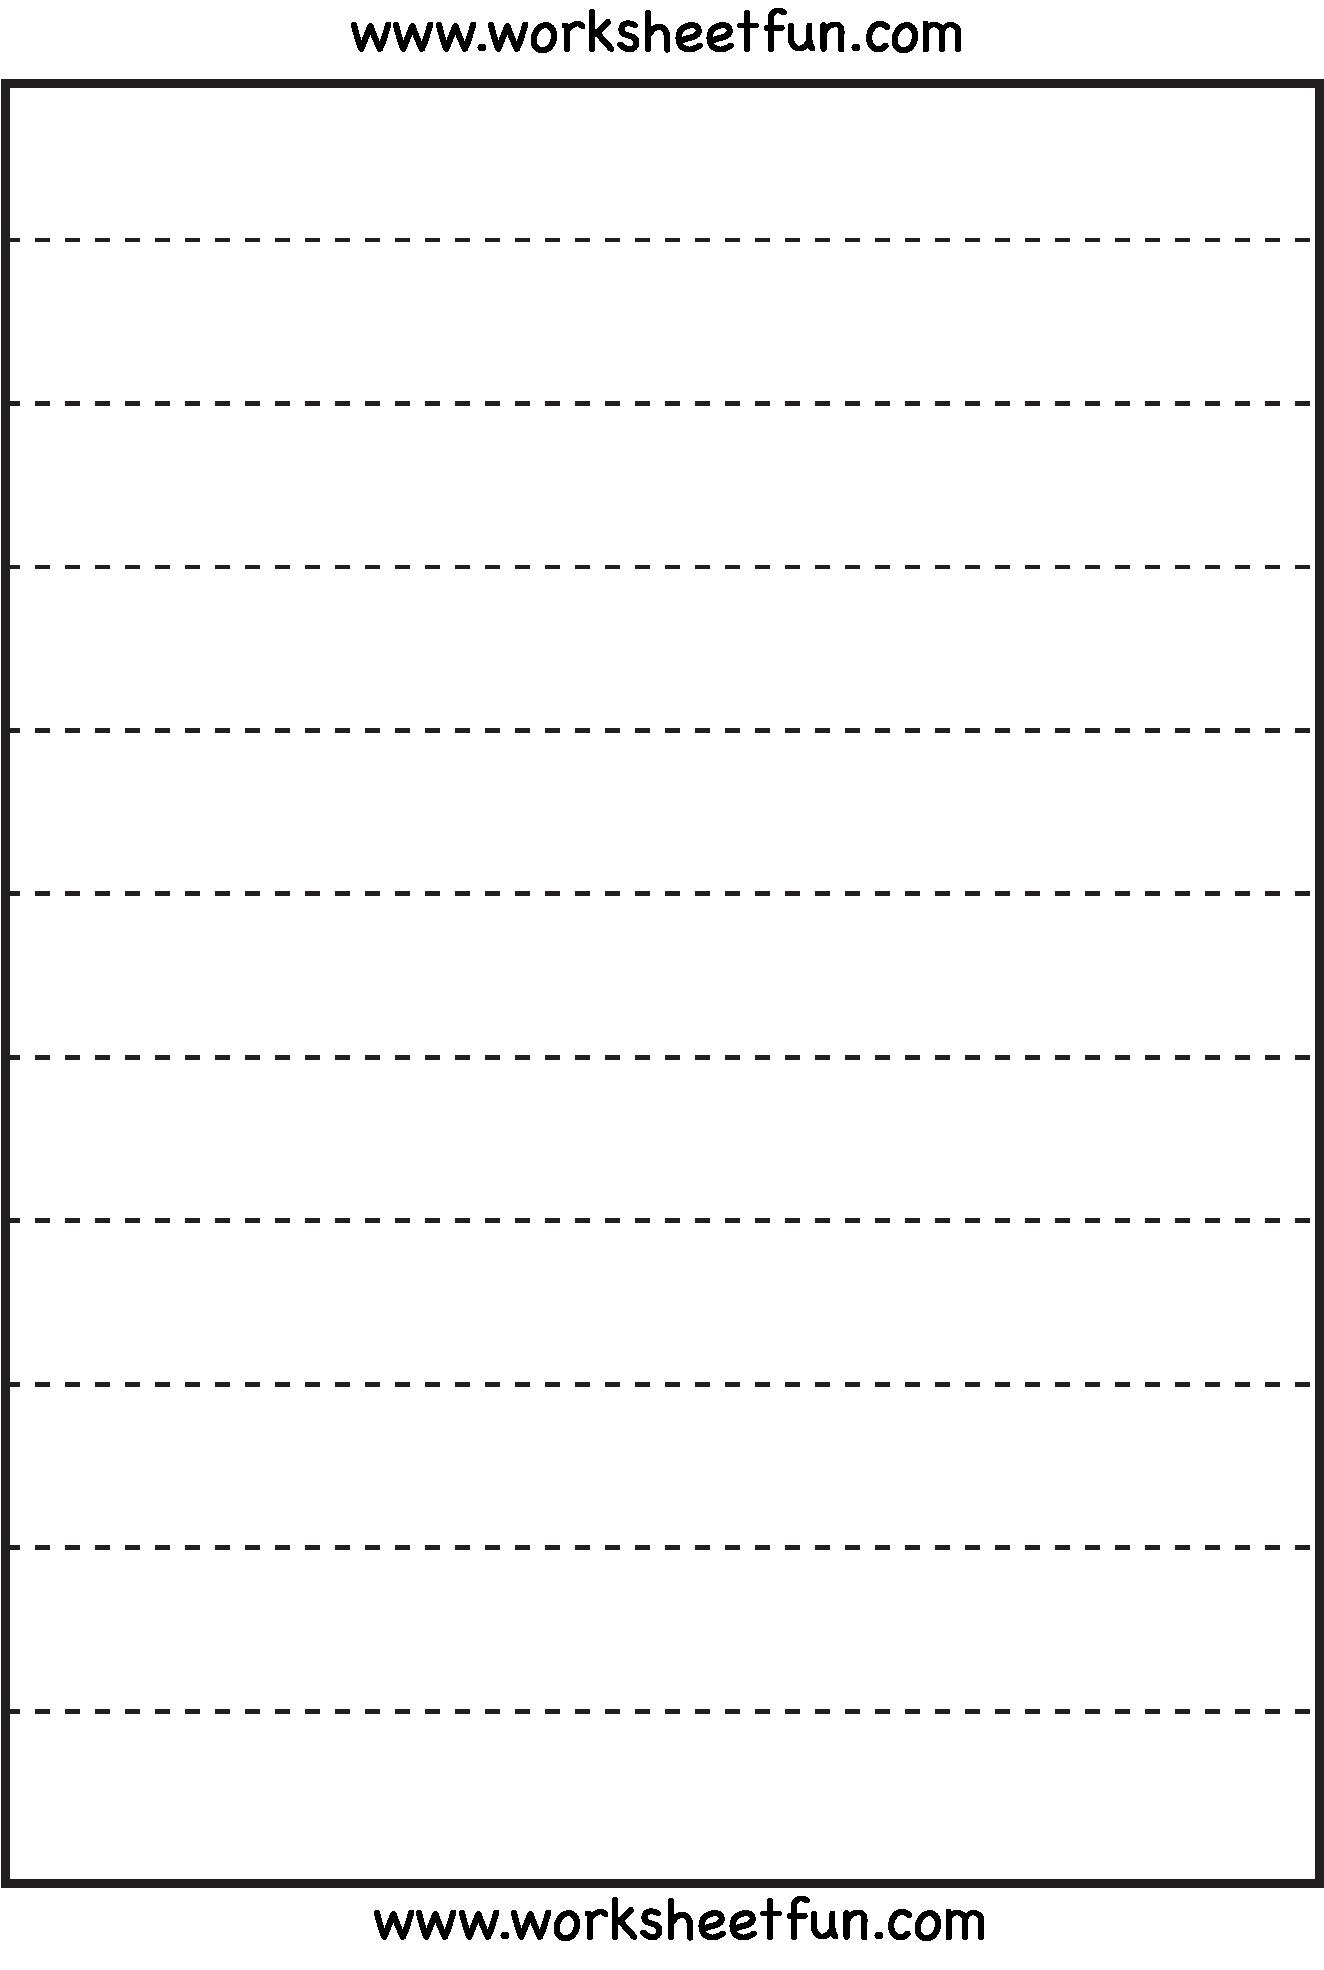 Straight Line Tracing